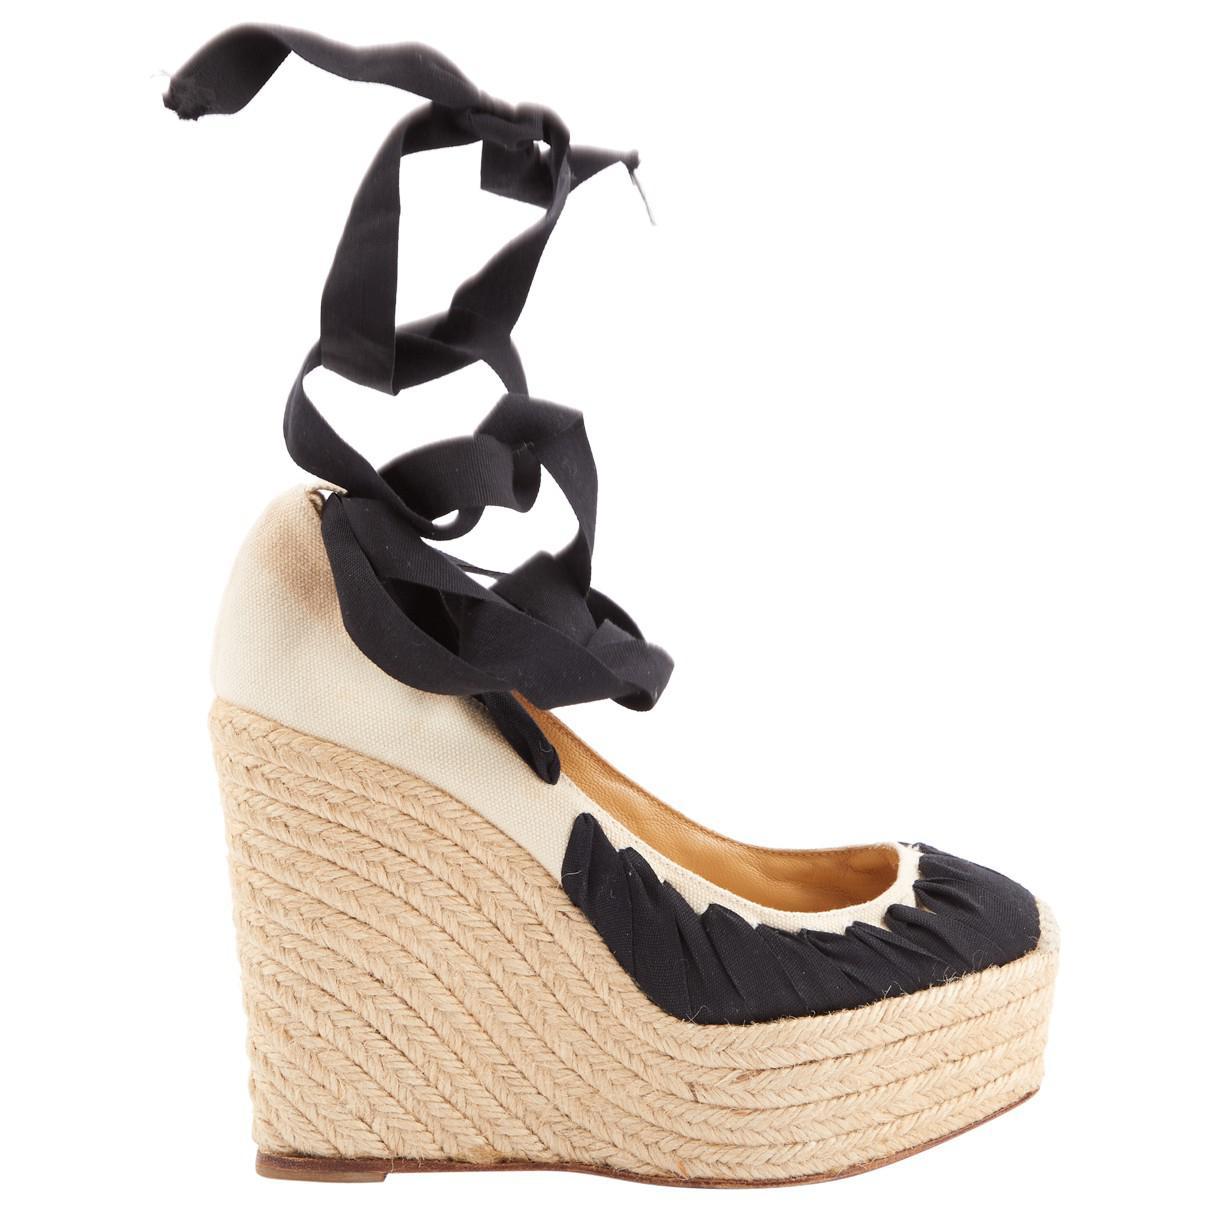 Christian Louboutin Cloth Sandals